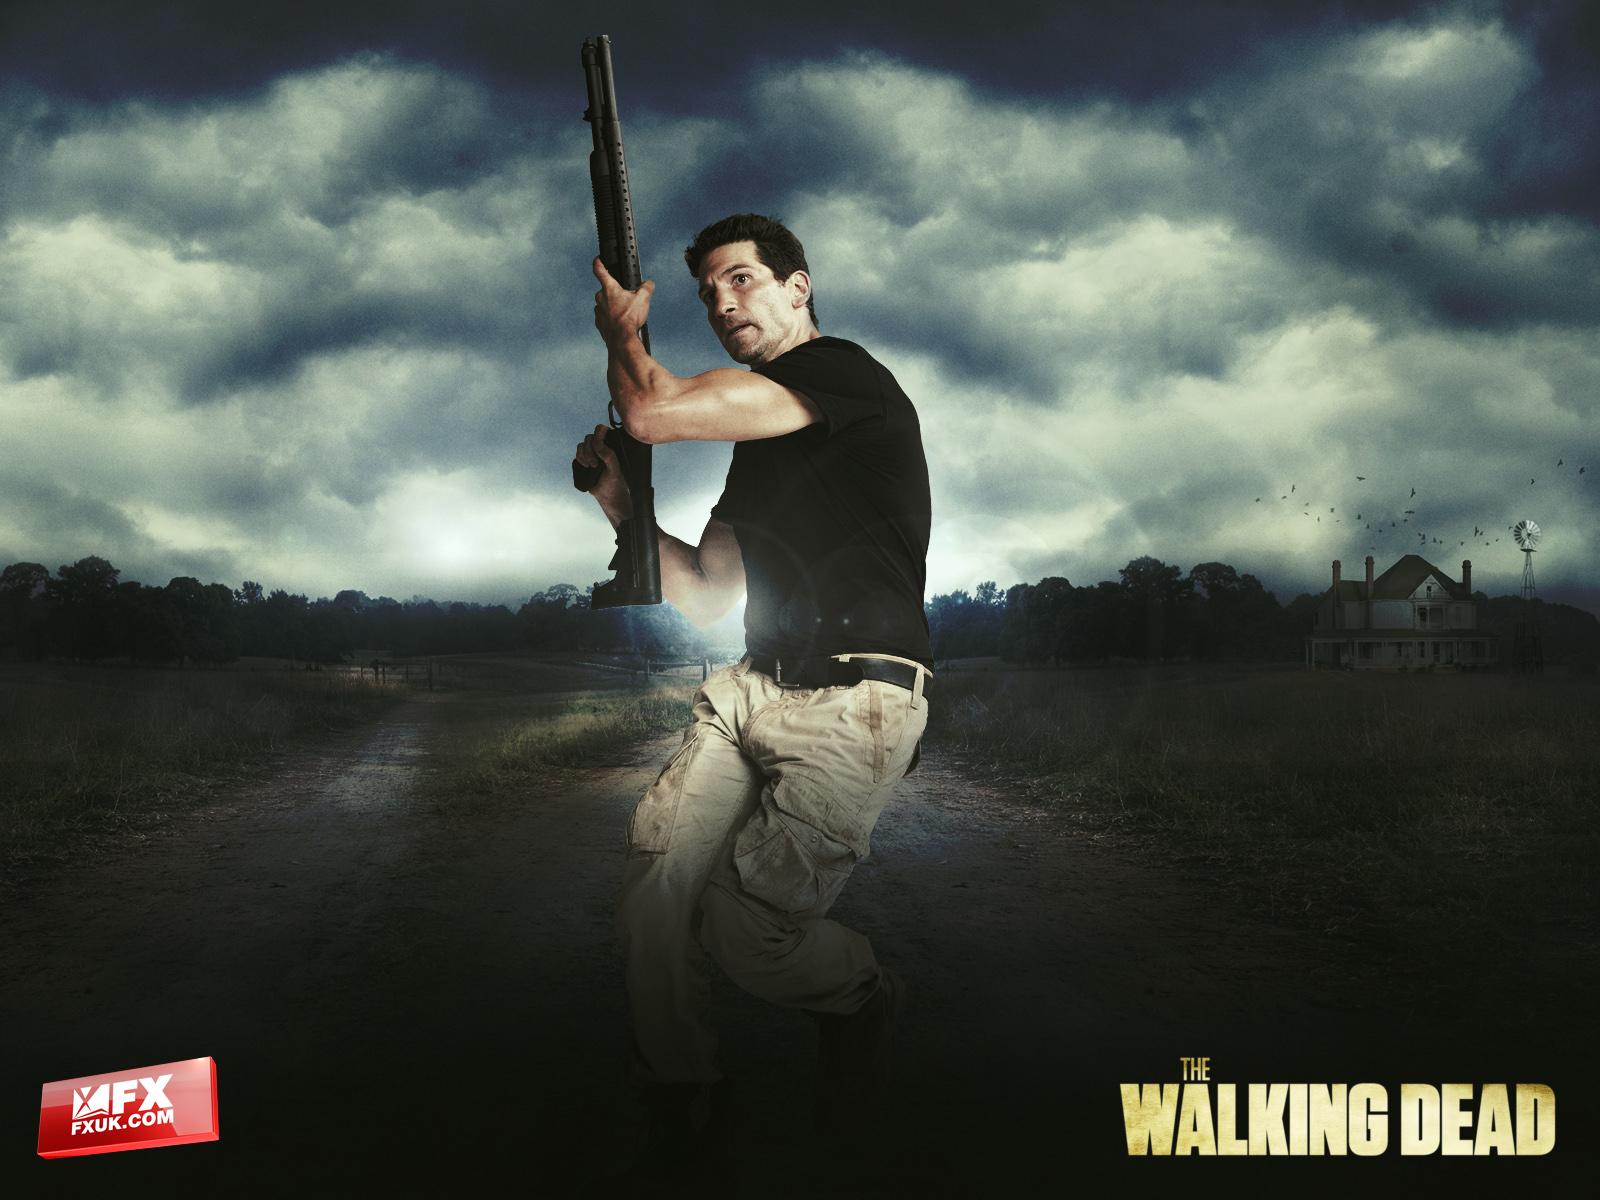 The Walking Dead Duvar Kağıdı 4 (Shane)